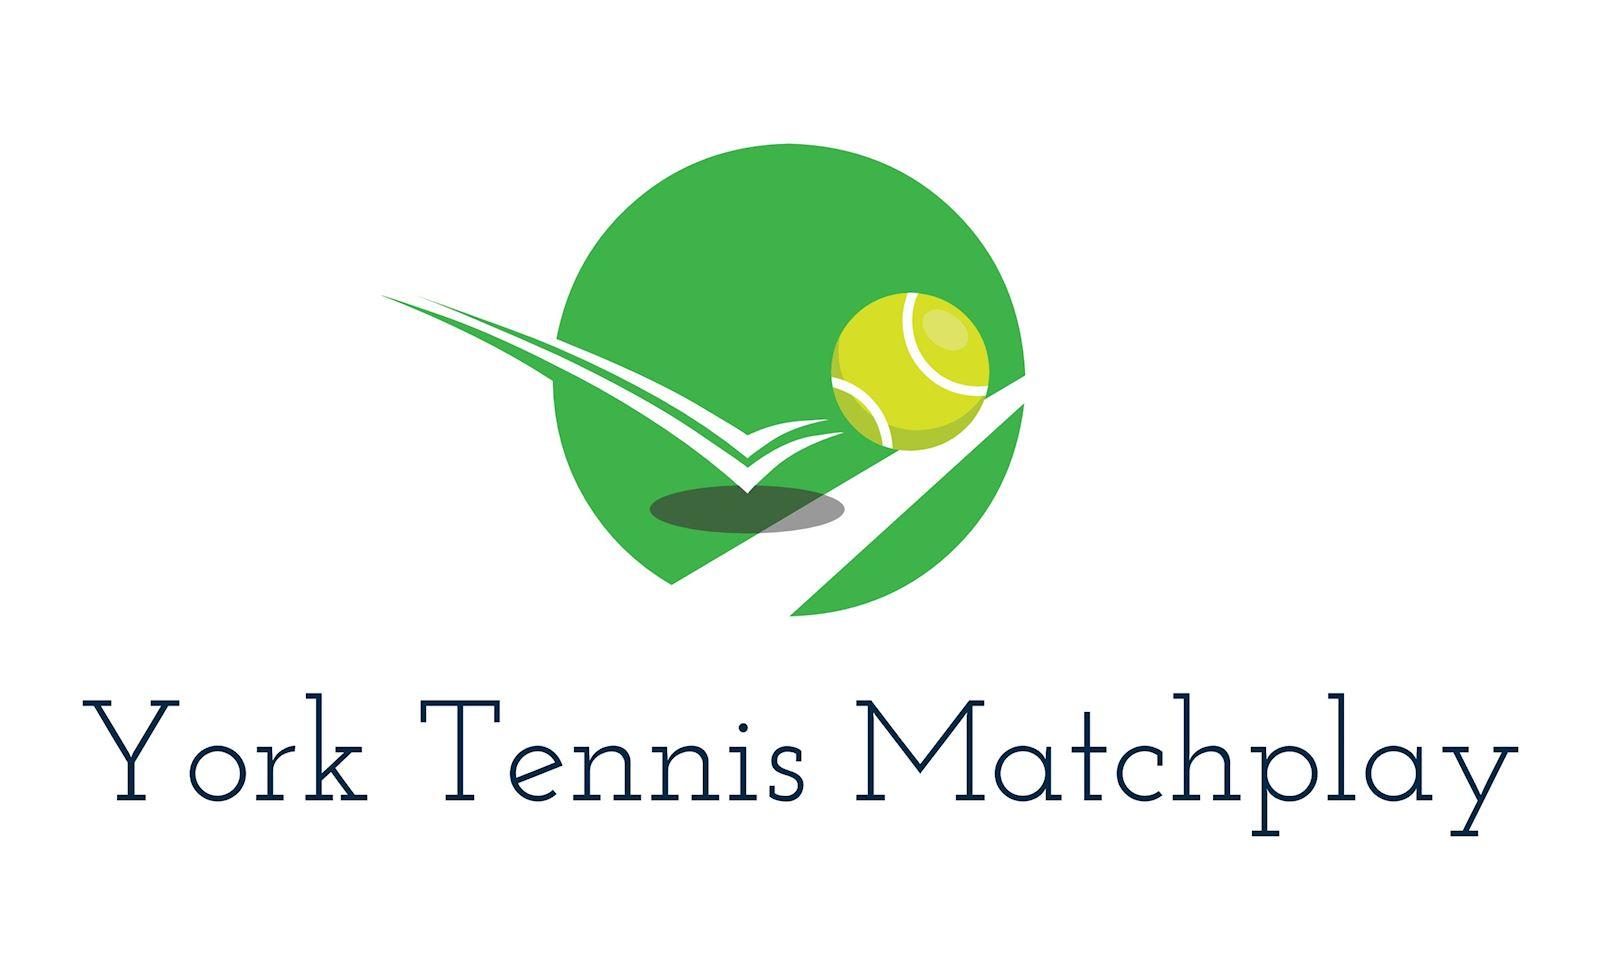 York Tennis Matchplay